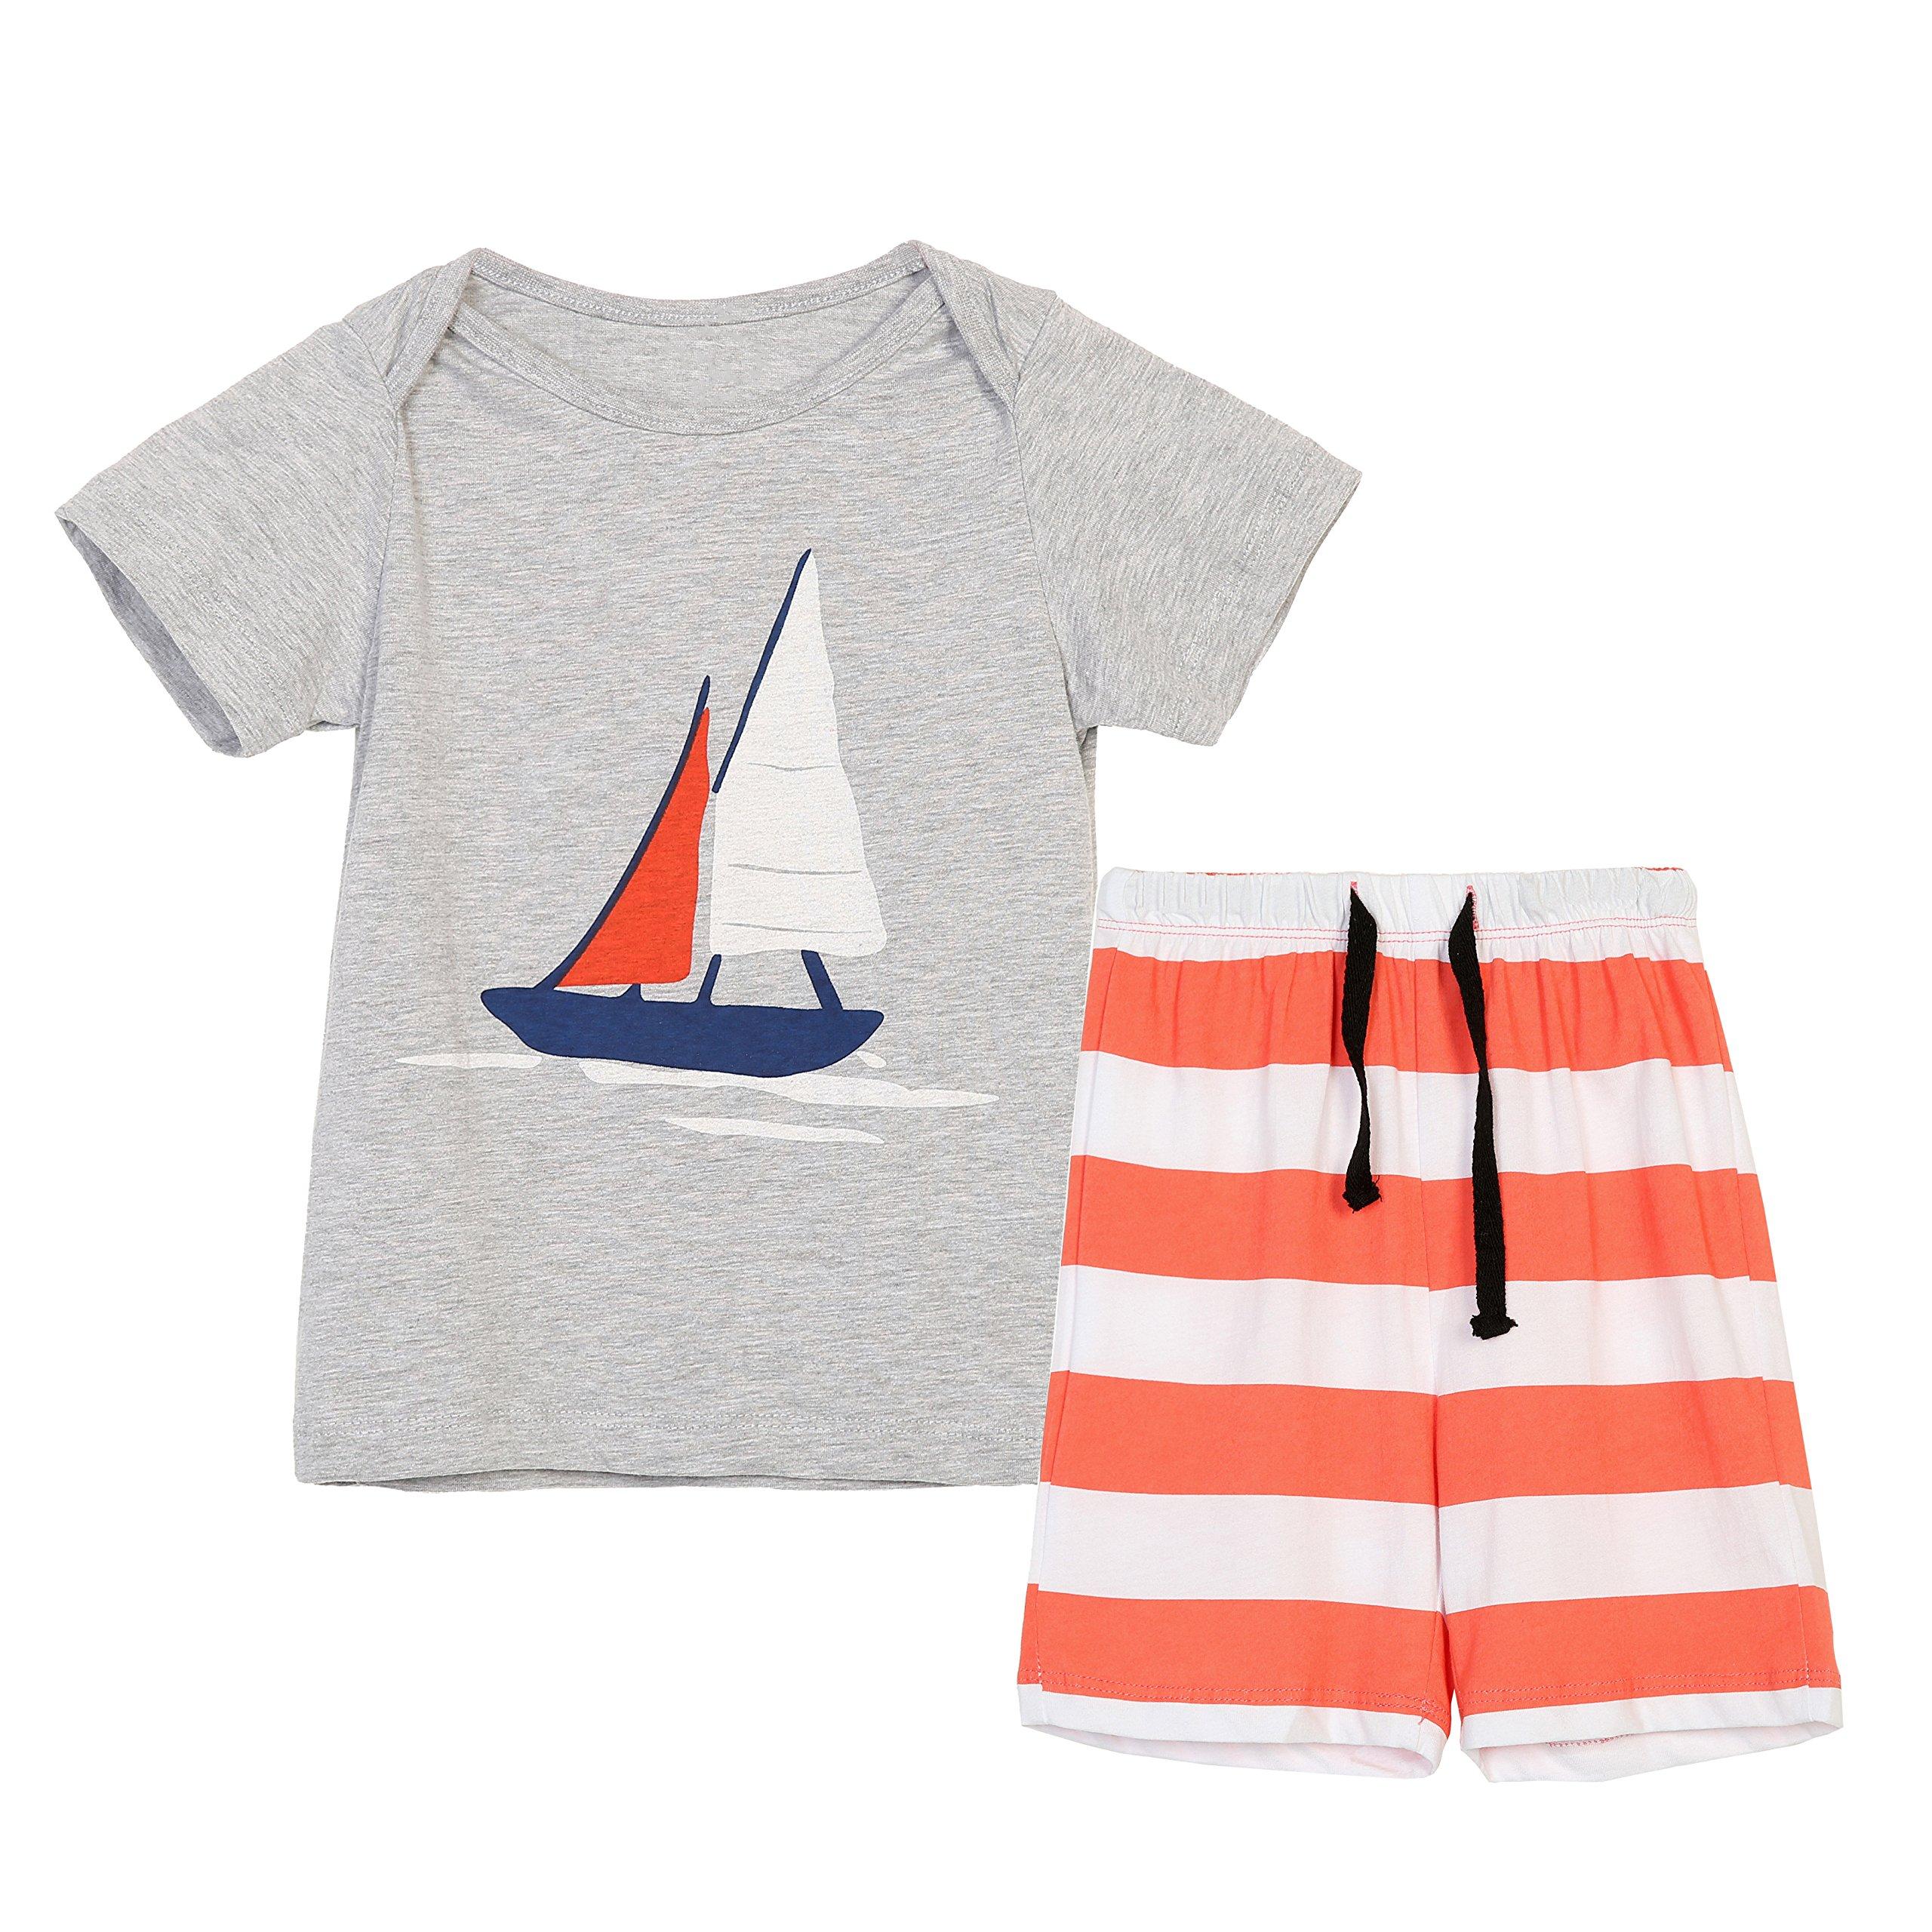 Boys Summer Cotton Short Sets Short Sleeve Graphic Print T-Shirts + Striped Shorts Gray 4T